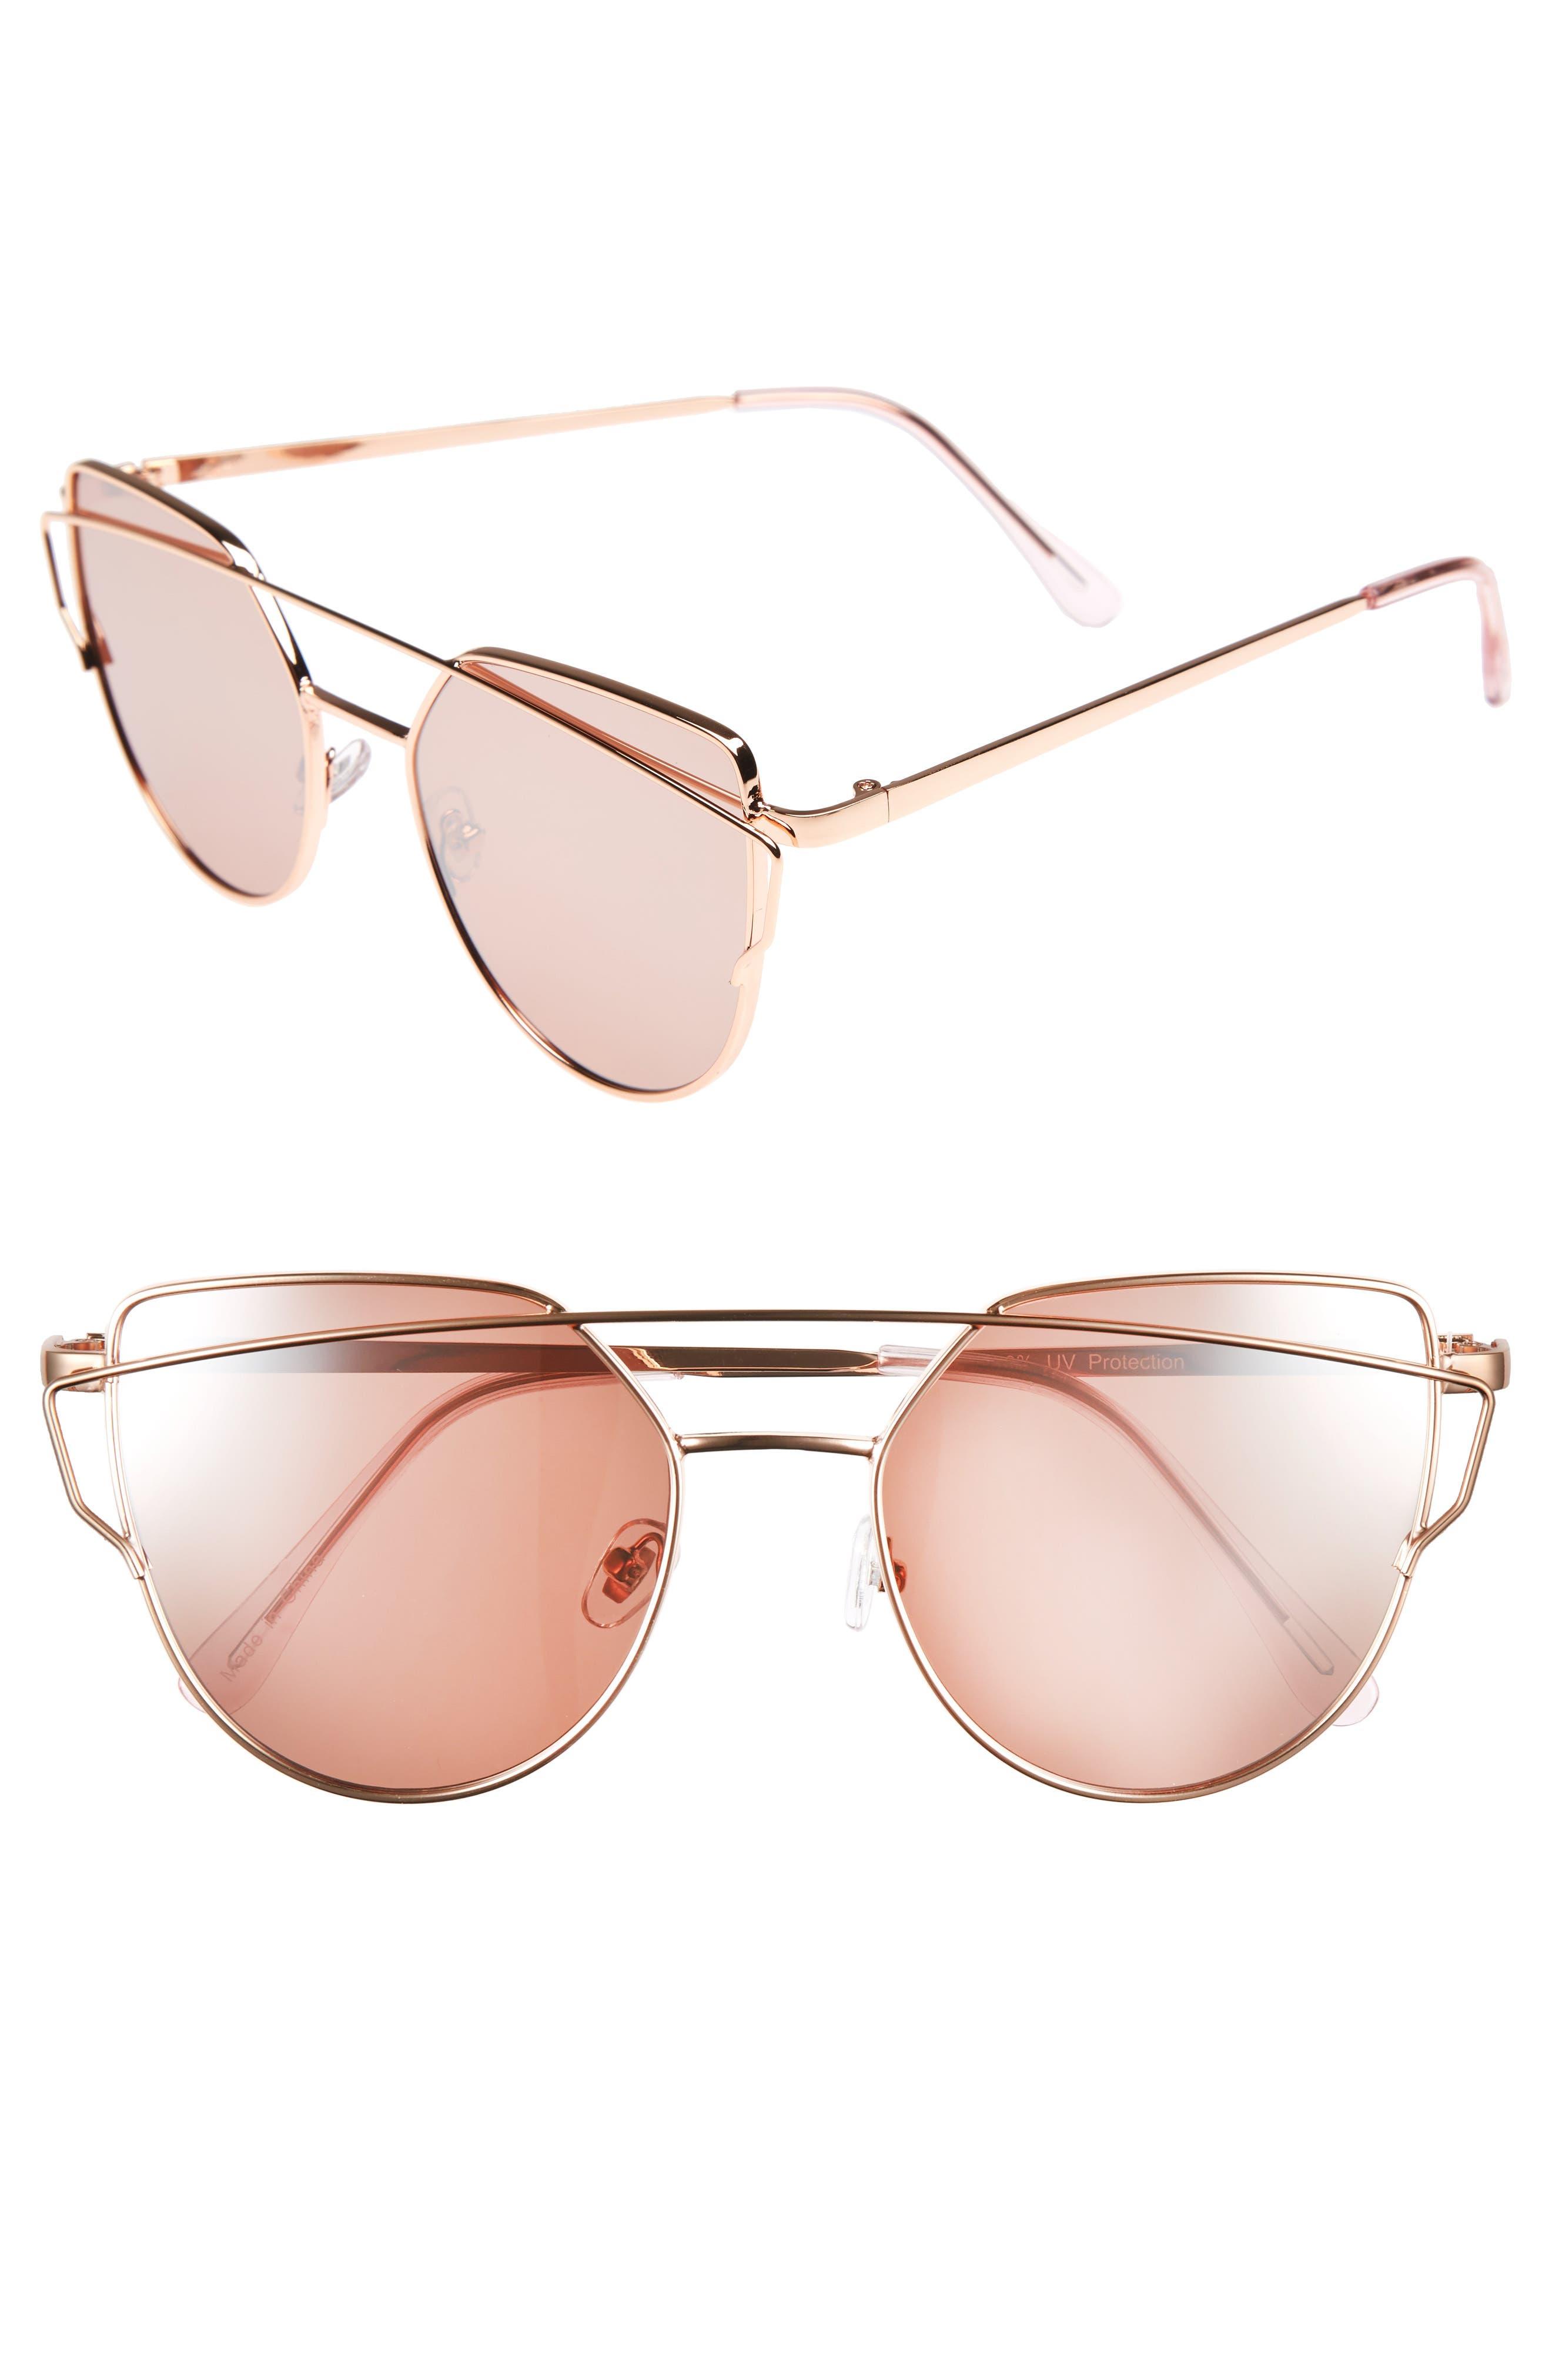 Alternate Image 1 Selected - BP. 51mm Thin Brow Angular Aviator Sunglasses